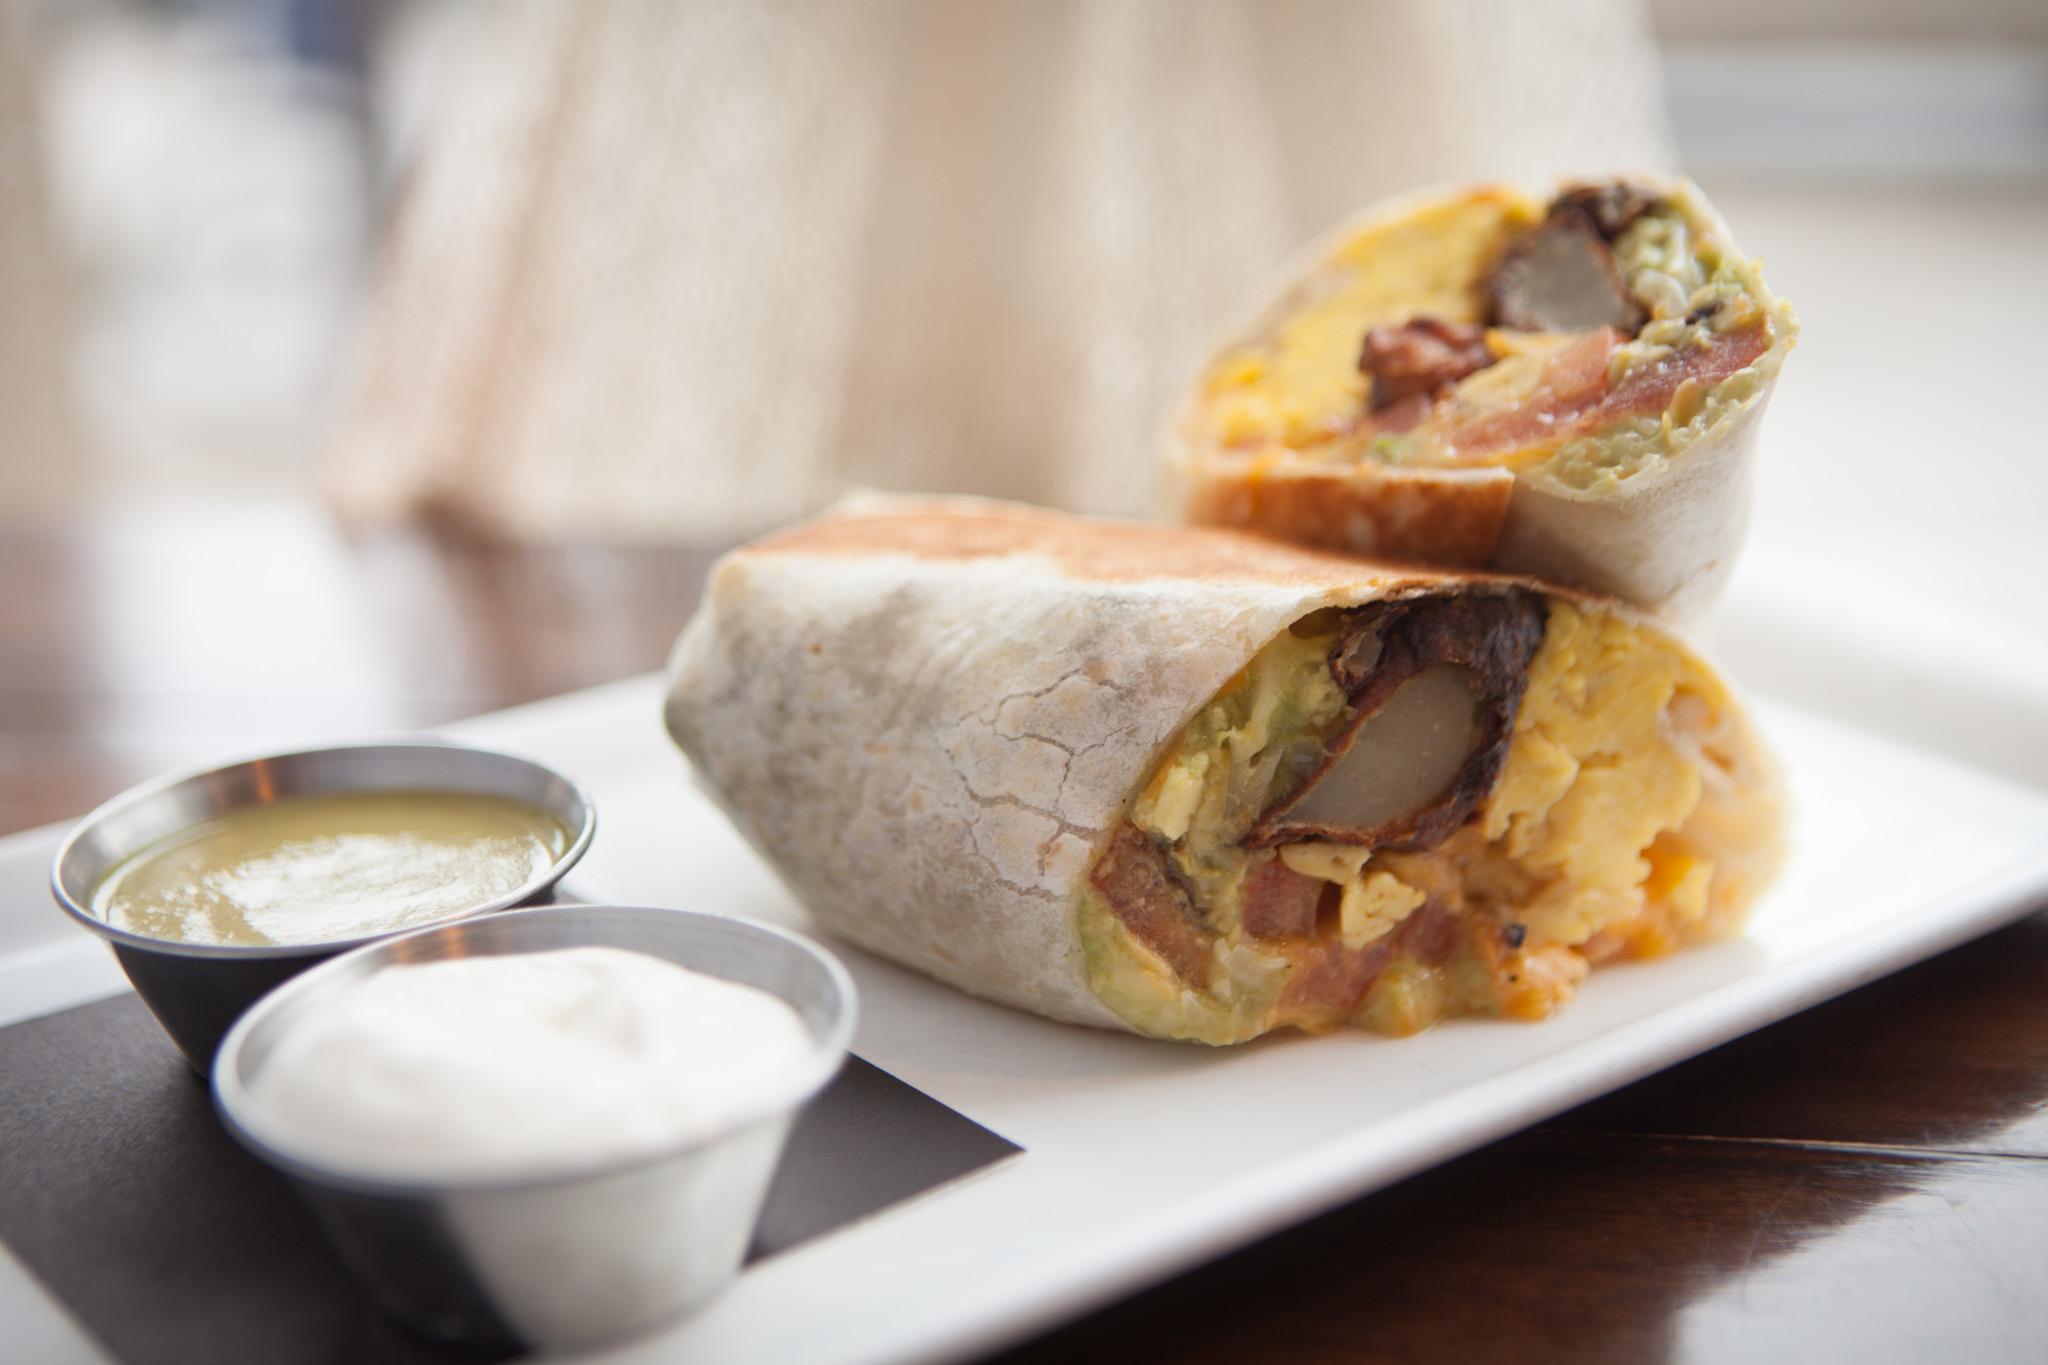 Breakfast burrito at Lula cafe.